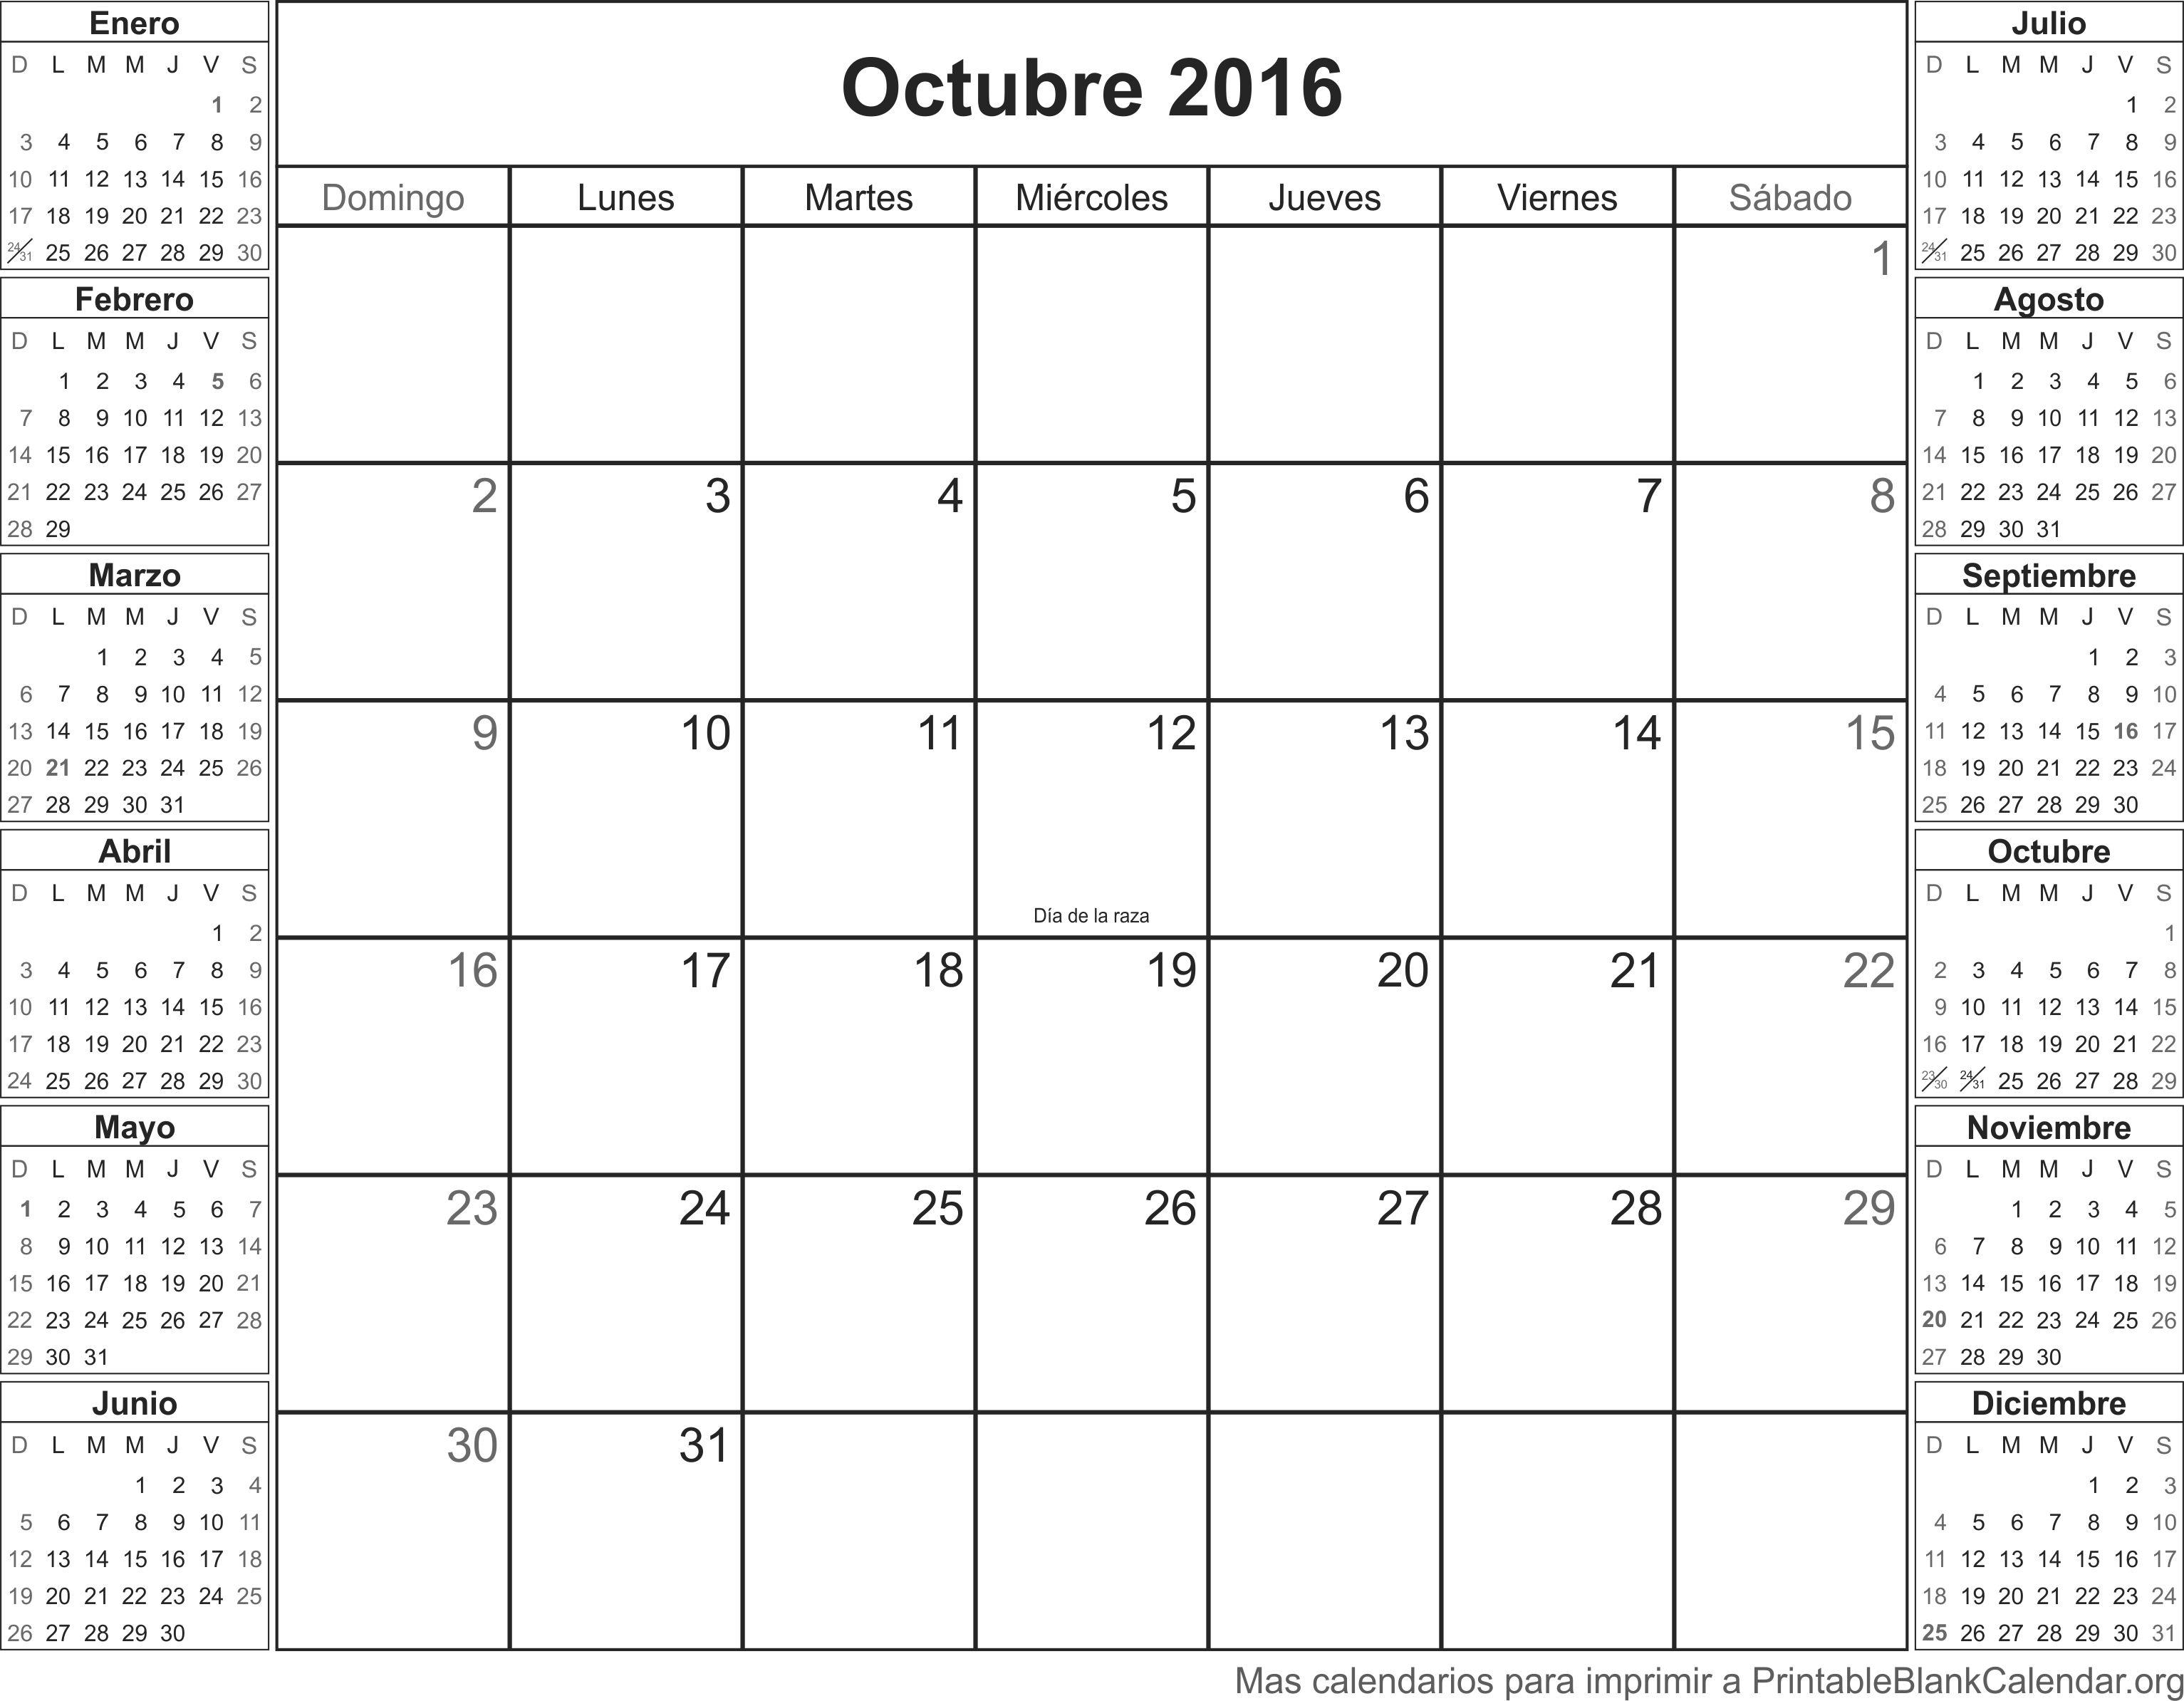 octubre 2016 calendario